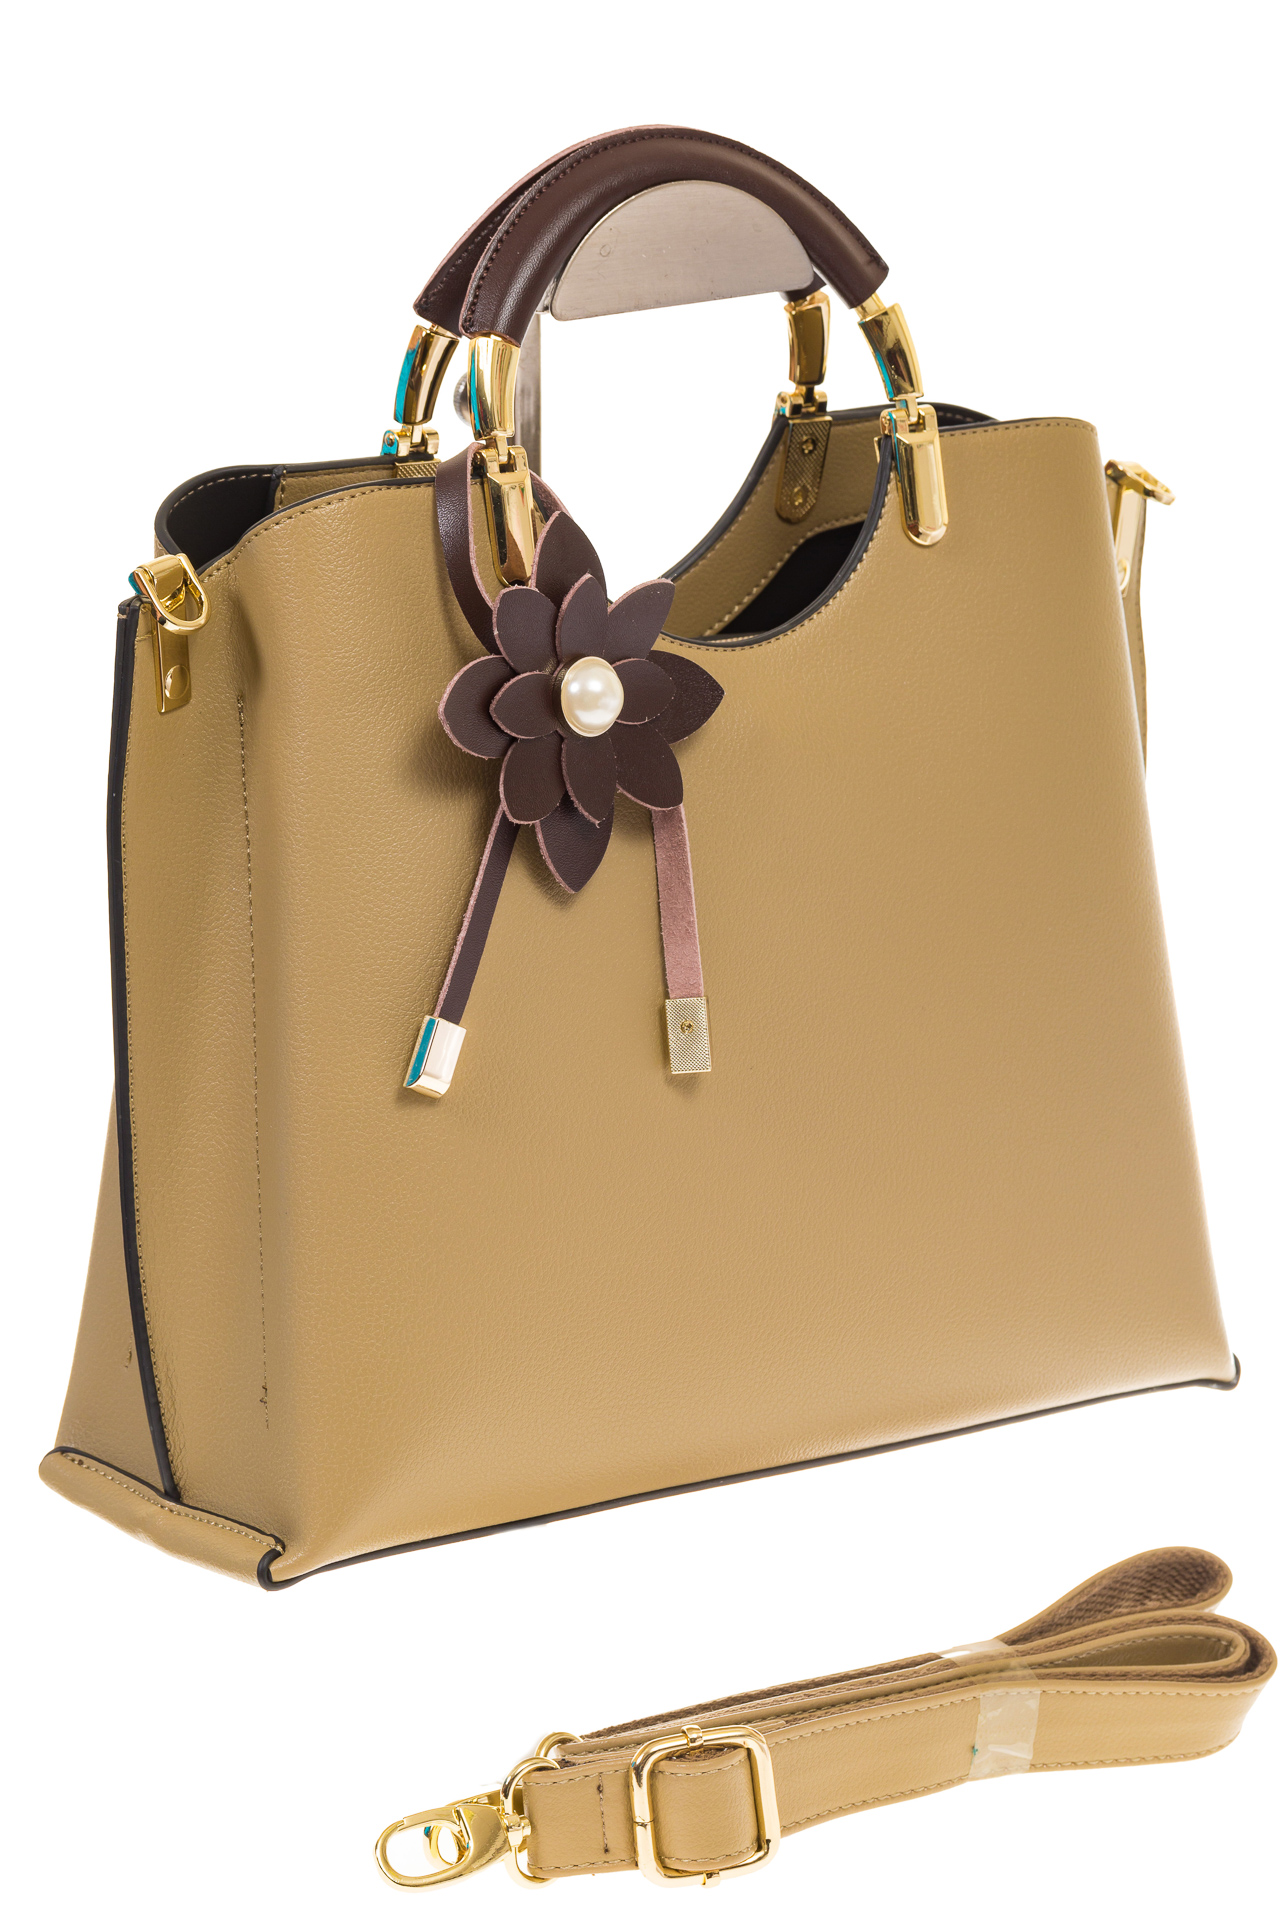 Сумка-тоут (59 фото): популярные модели tote bag